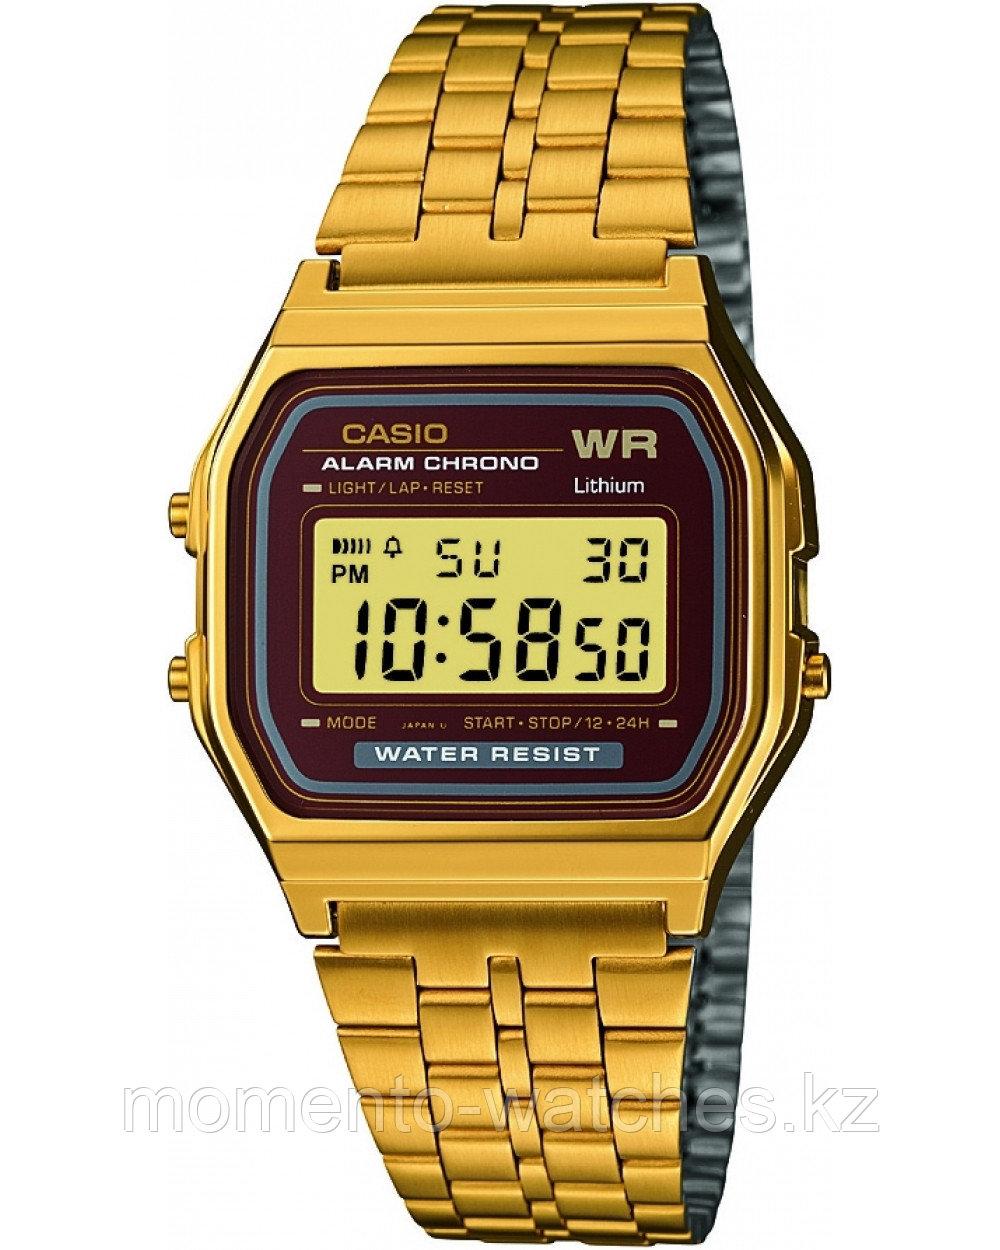 Мужские часы Casio A159WGEA-5DF